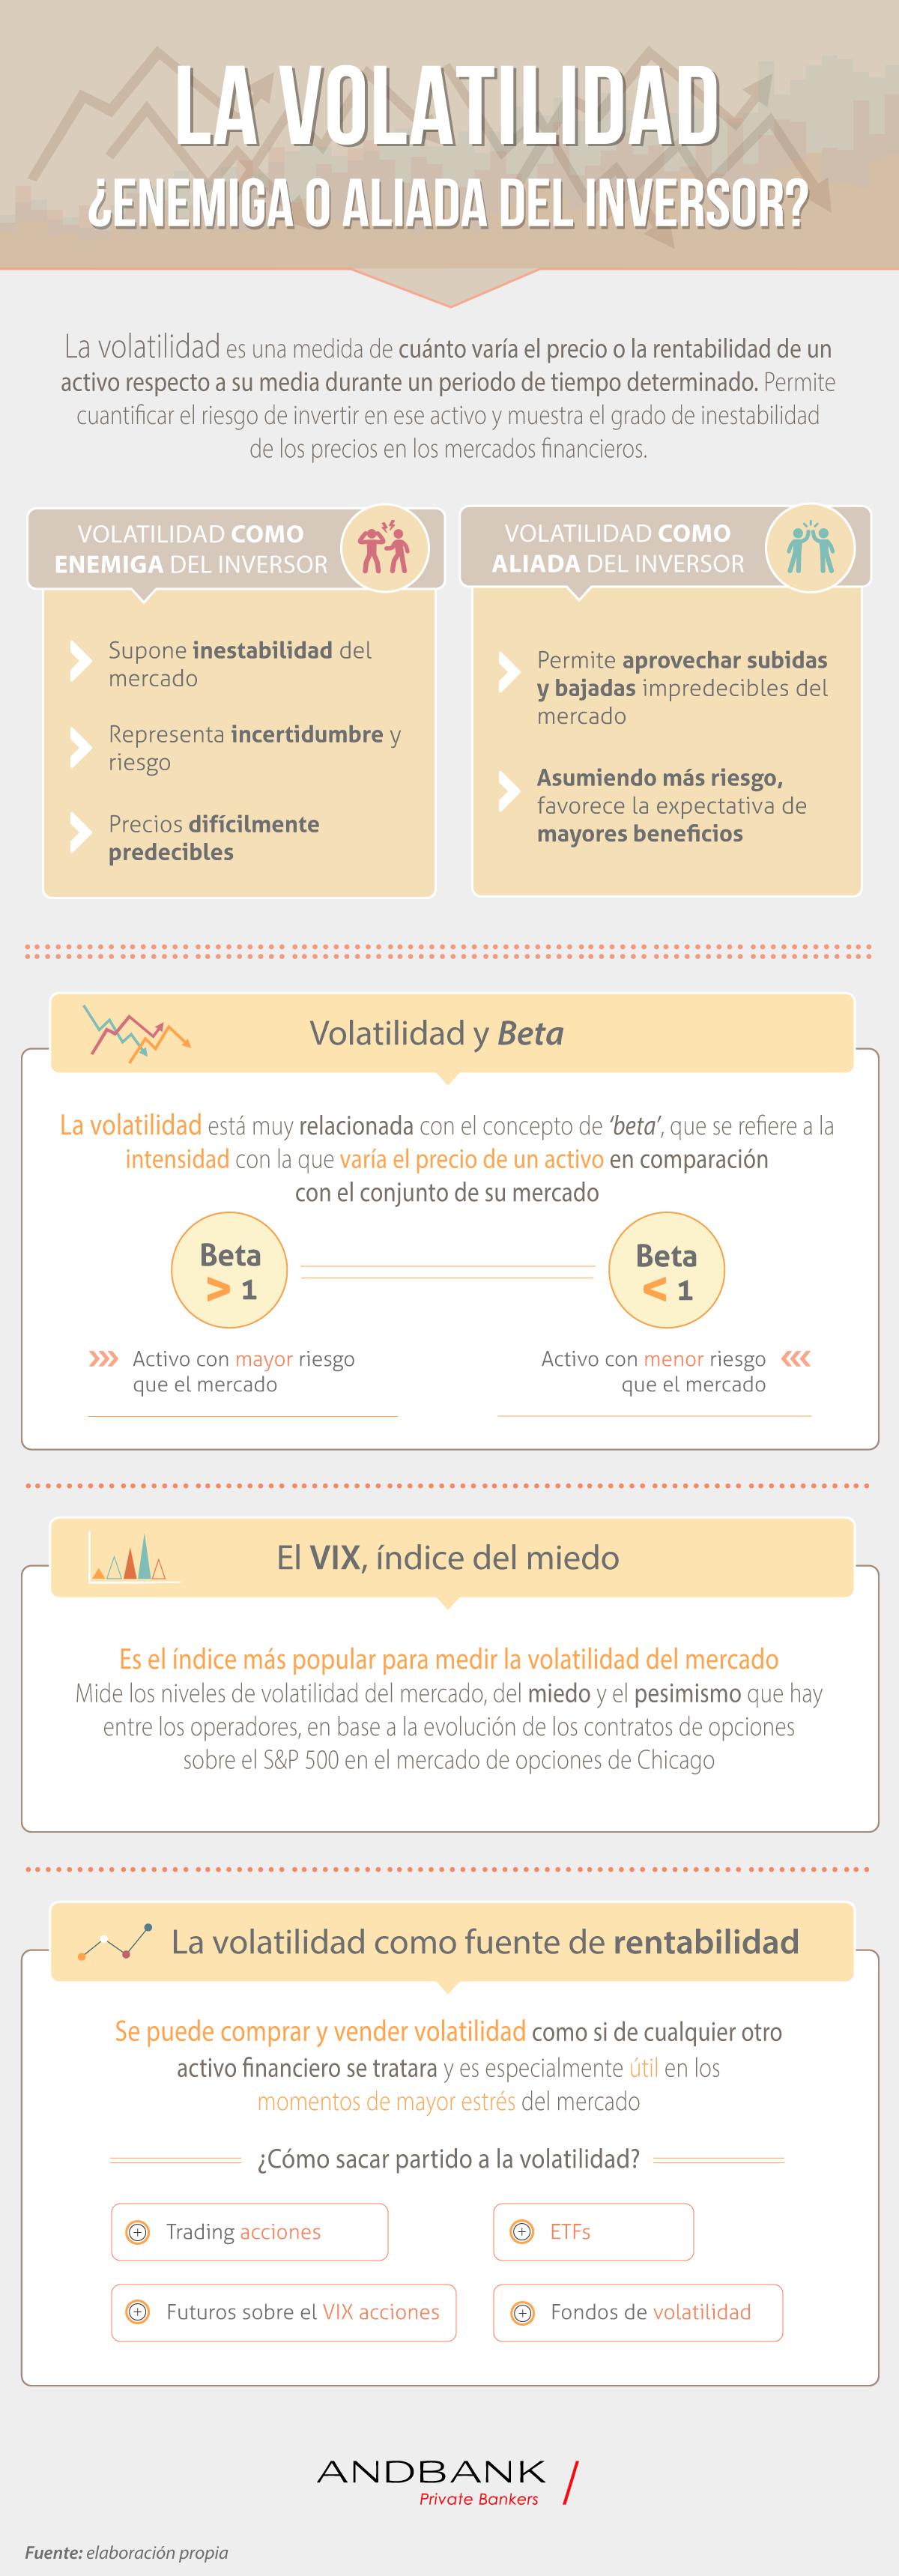 Andbank infografia volatilidad